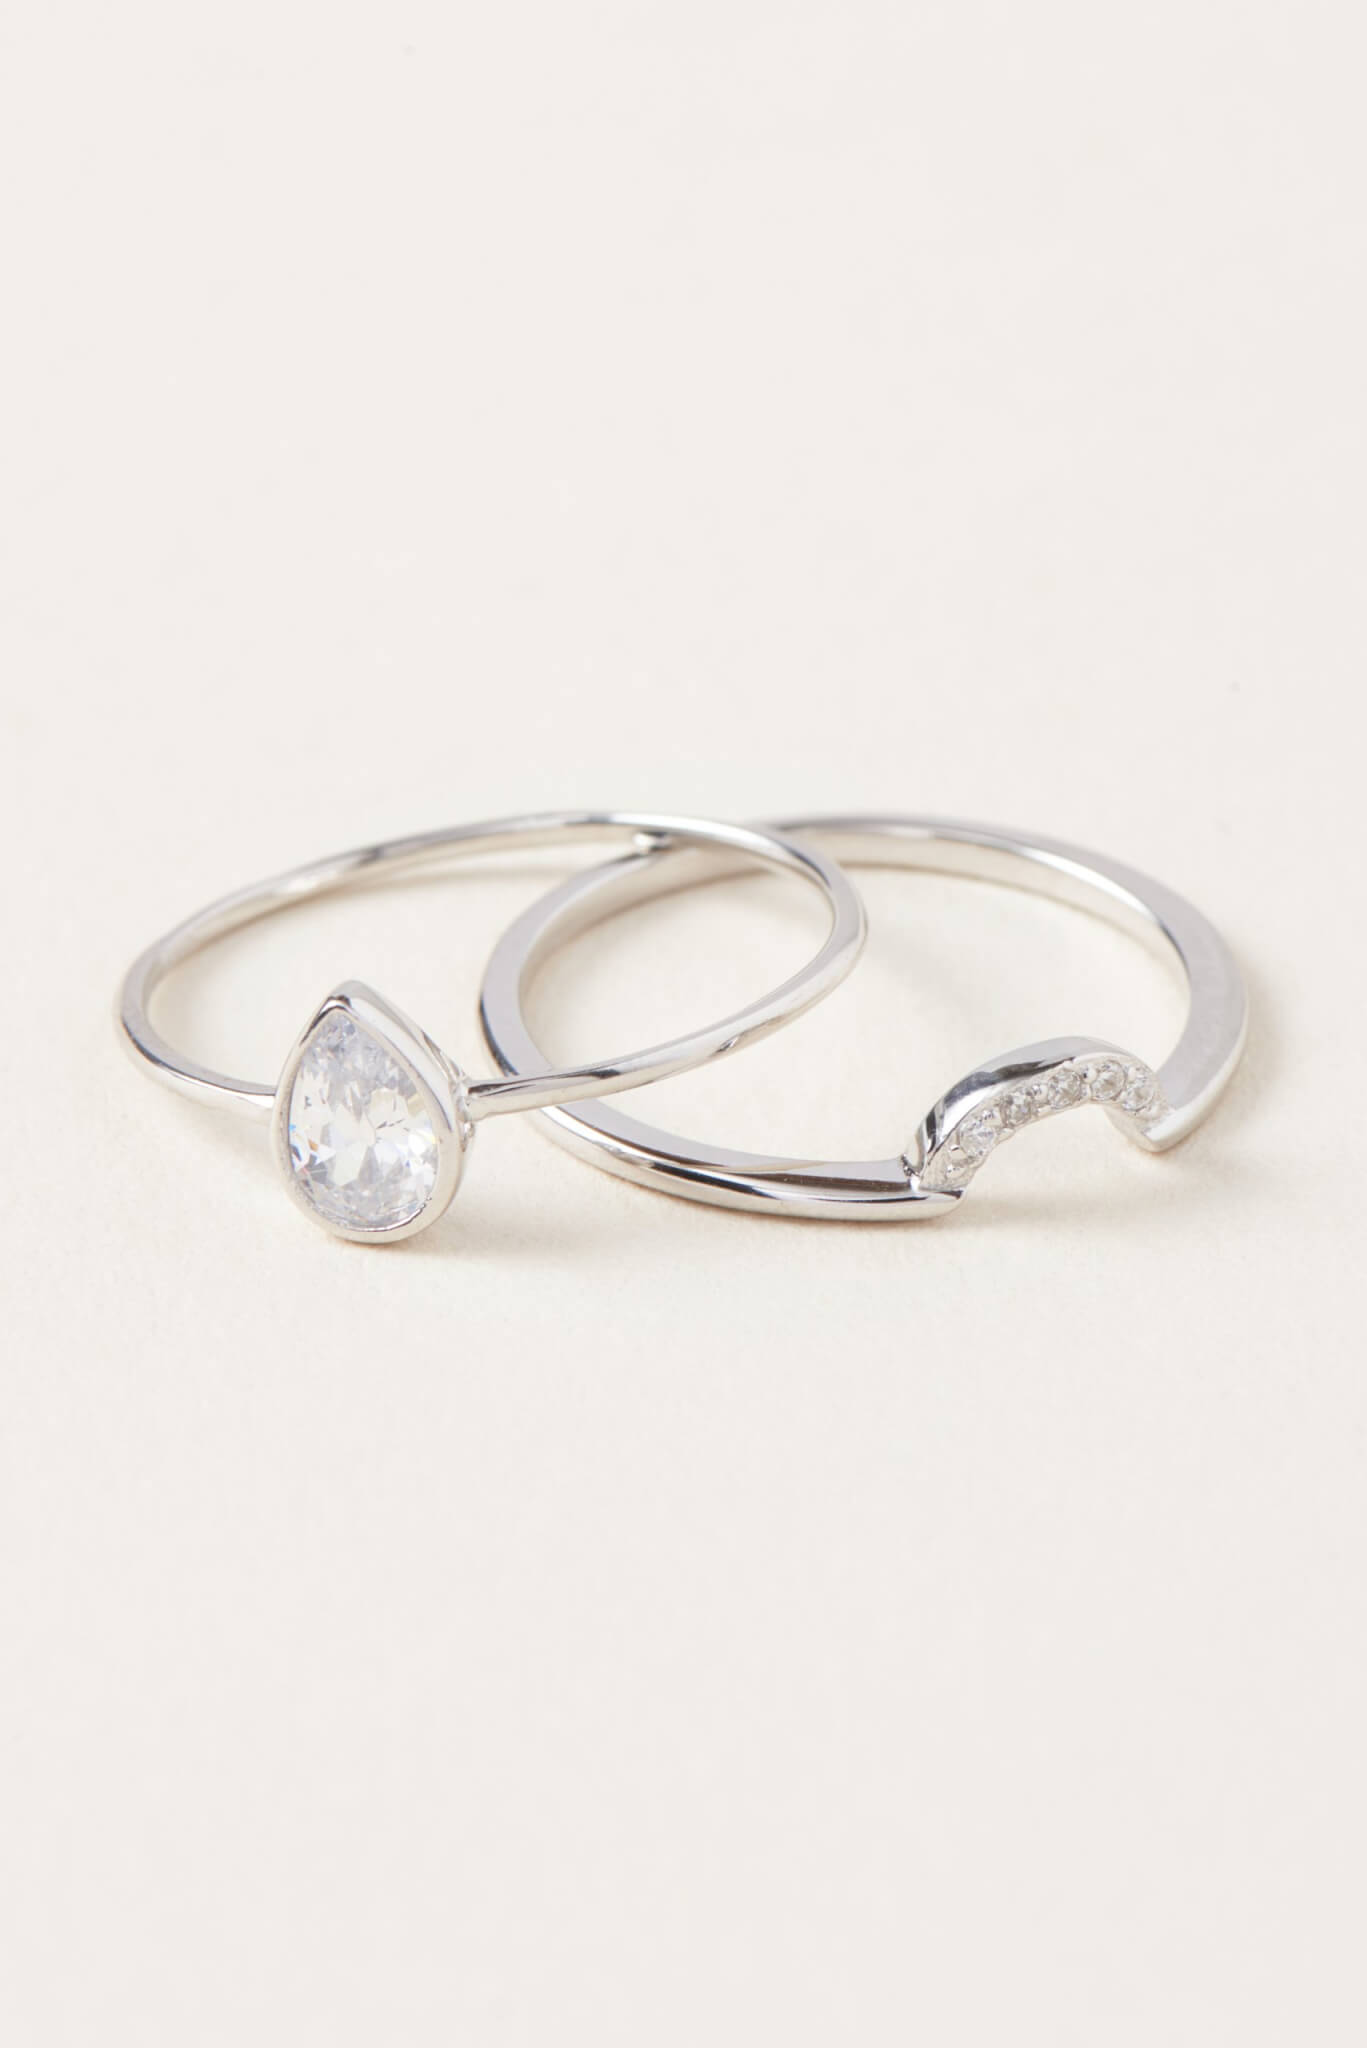 fashion jewelry silver wedding ring